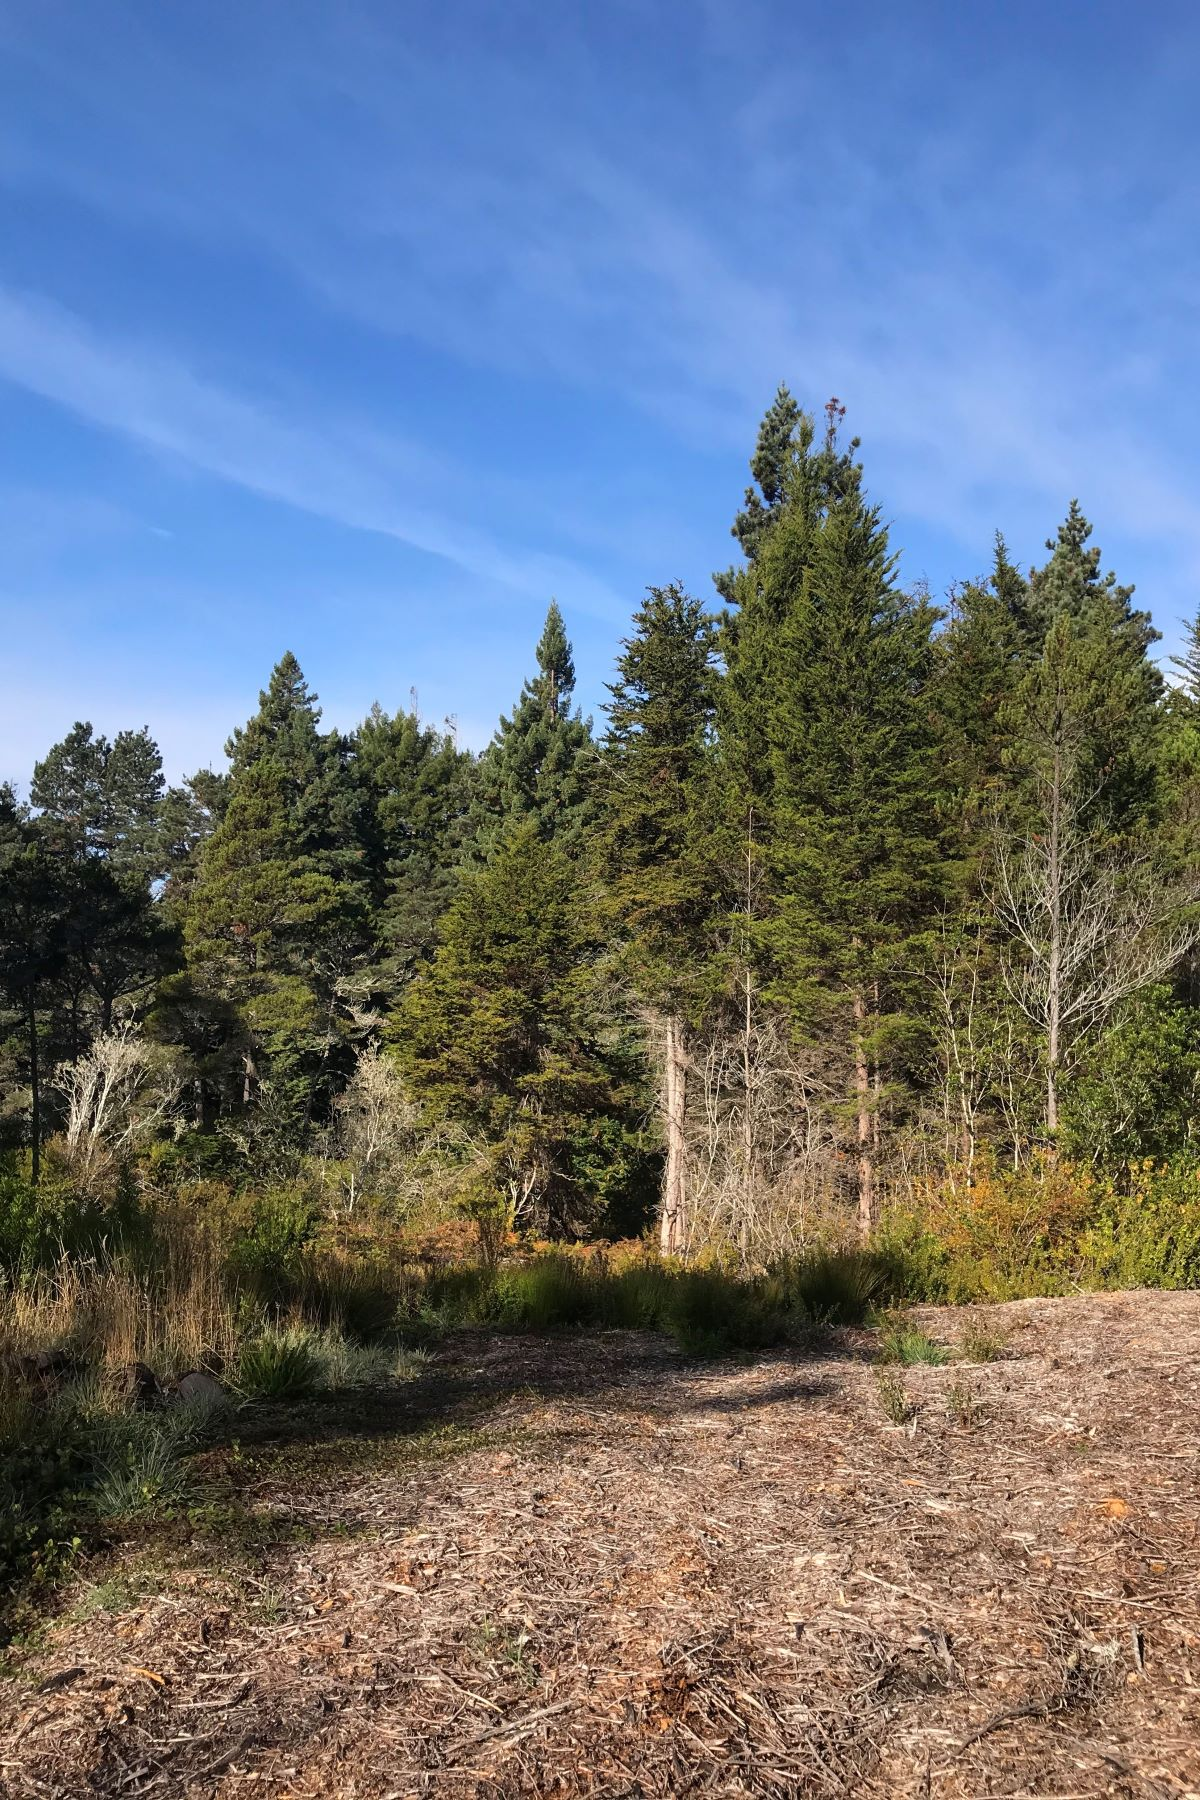 Land for Sale at Doyle Creek Sunny Parcel 43187 Caspar Little Lake Rd. Mendocino, California 95460 United States